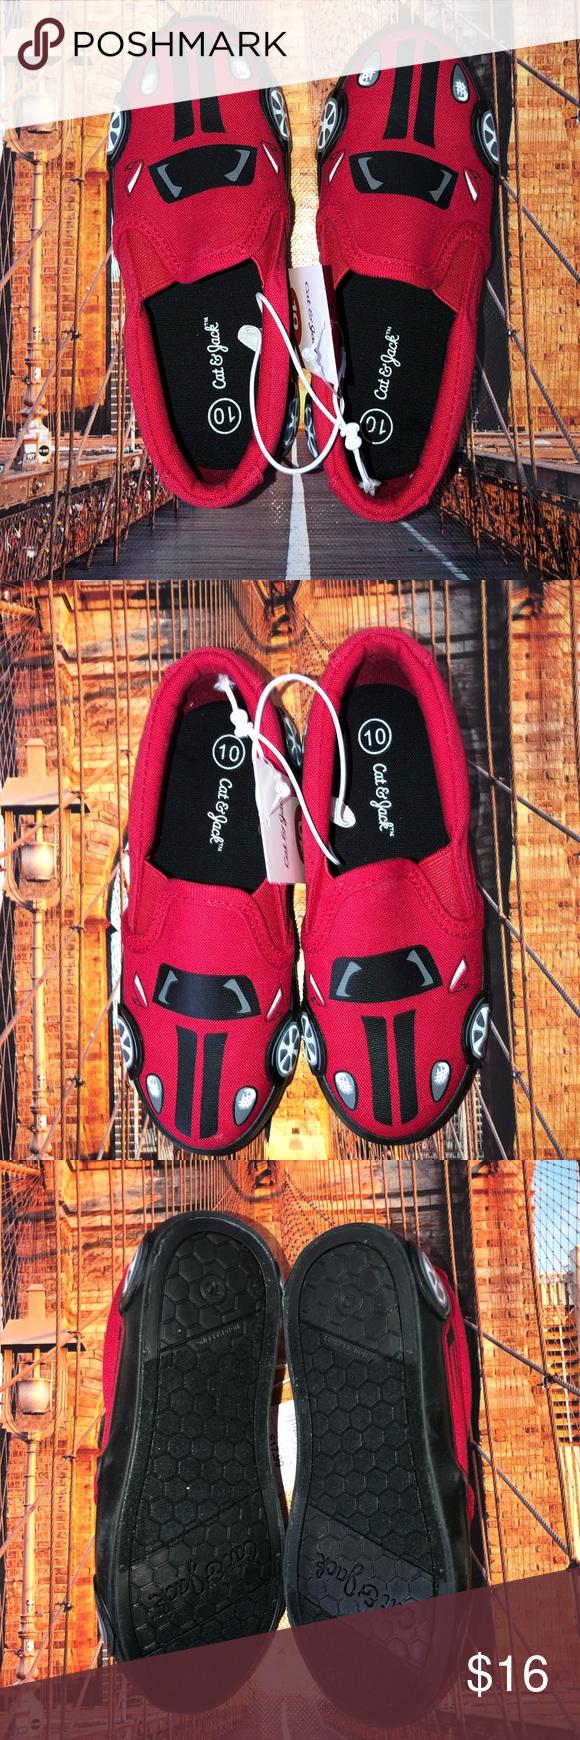 Cat \u0026 Jack Boys Sneakers | Boys